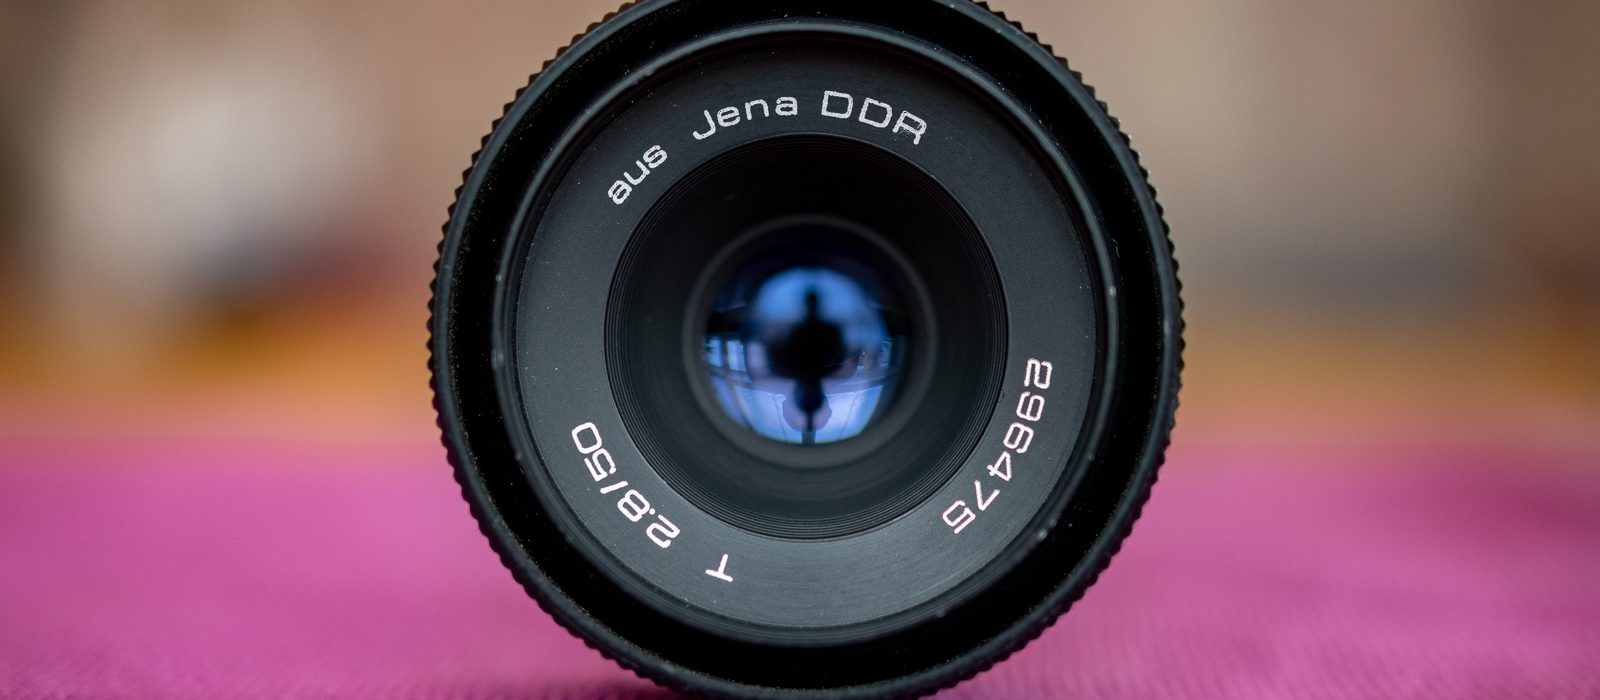 aus Jena DDR 50mm f/2.8 | Norbert Eder Photography